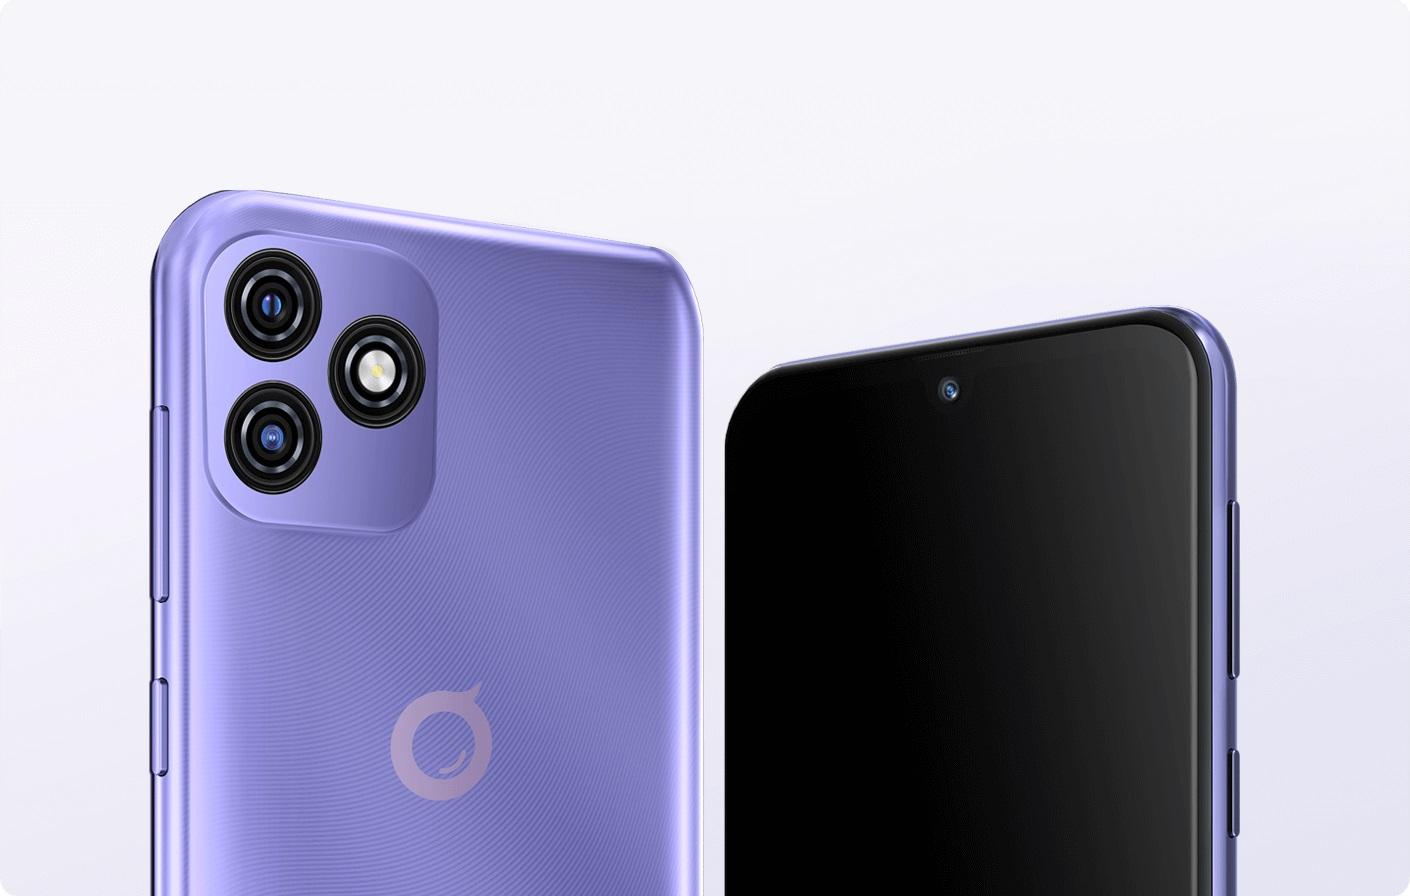 smartfon Oscal C20 smartphone